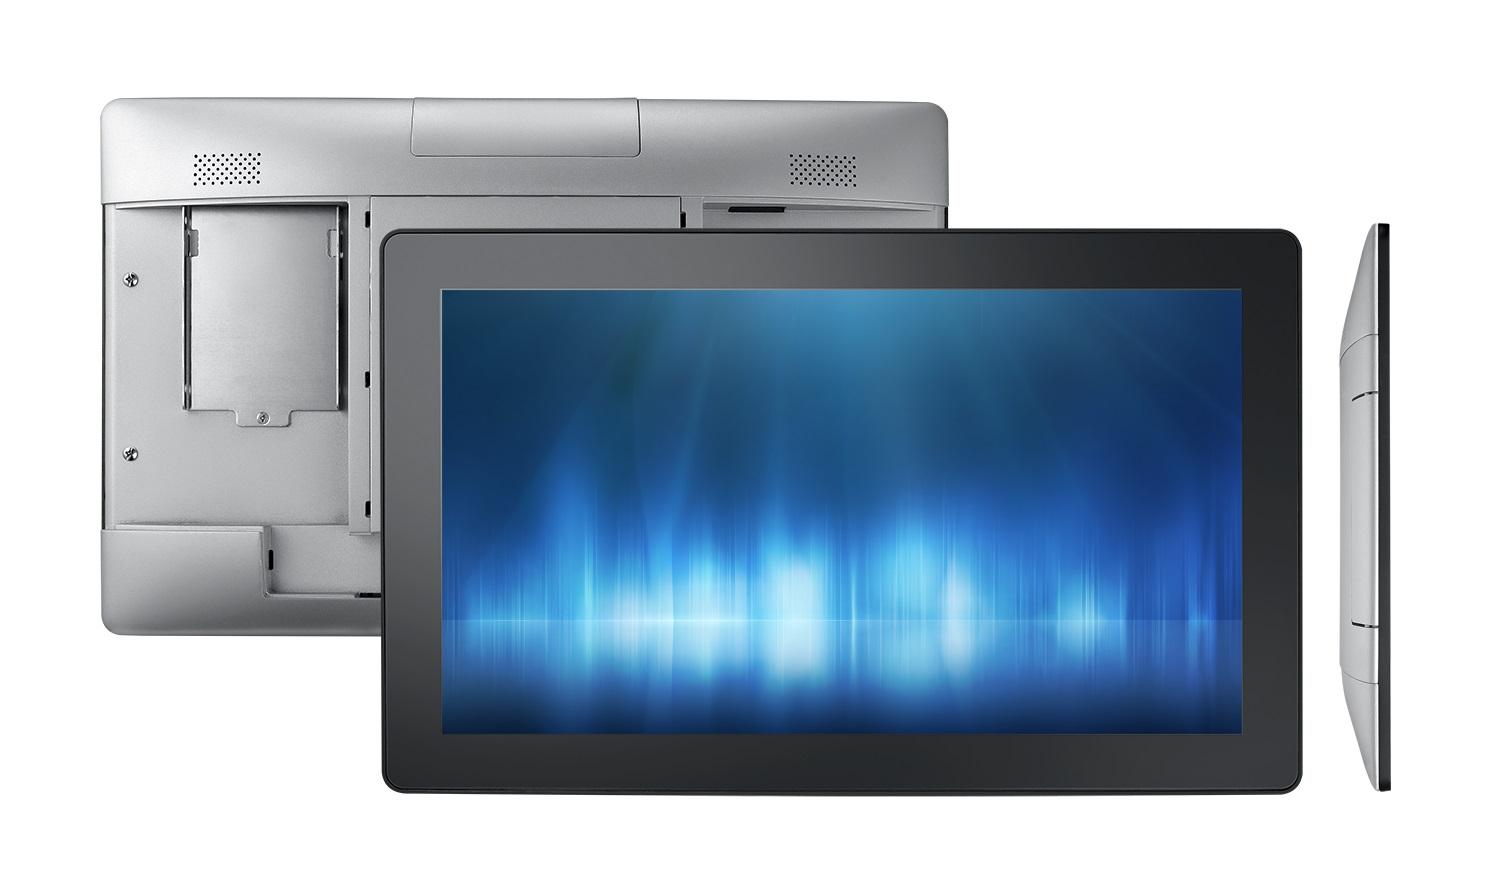 Slim. Stylish. UTC-100 Series: Advantech Launches UTC-100 Series Ultra-Slim All-in-One Touch Computer